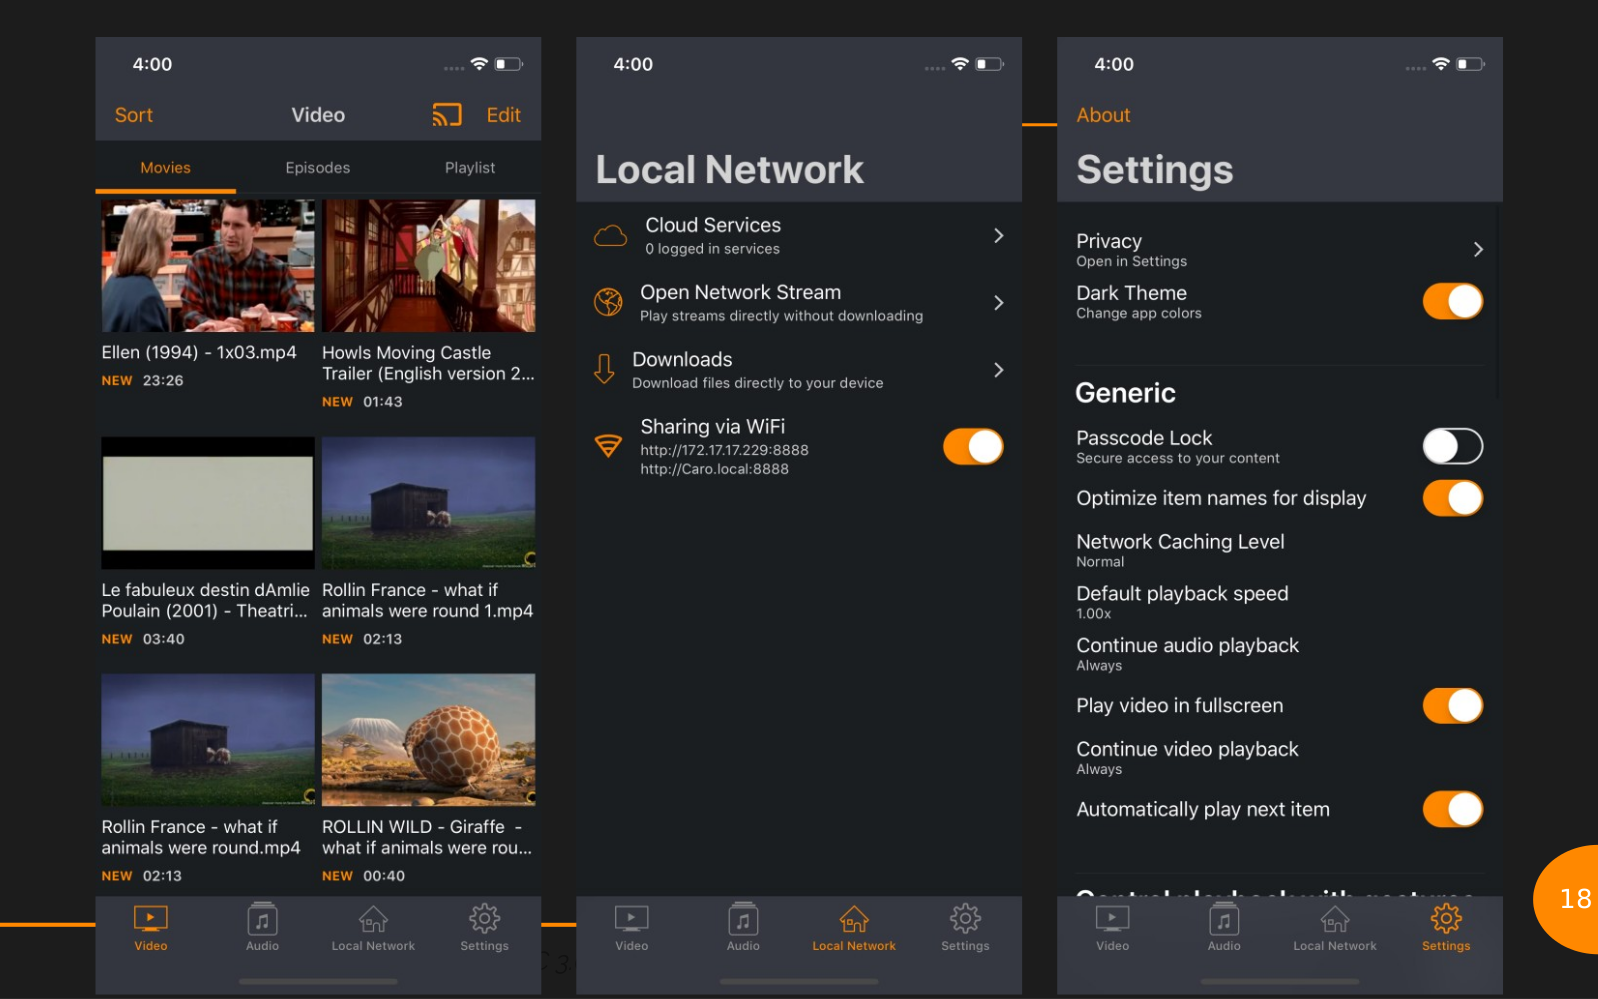 Le point sur VLC 4 0 : Media Library généralisée, AirPlay